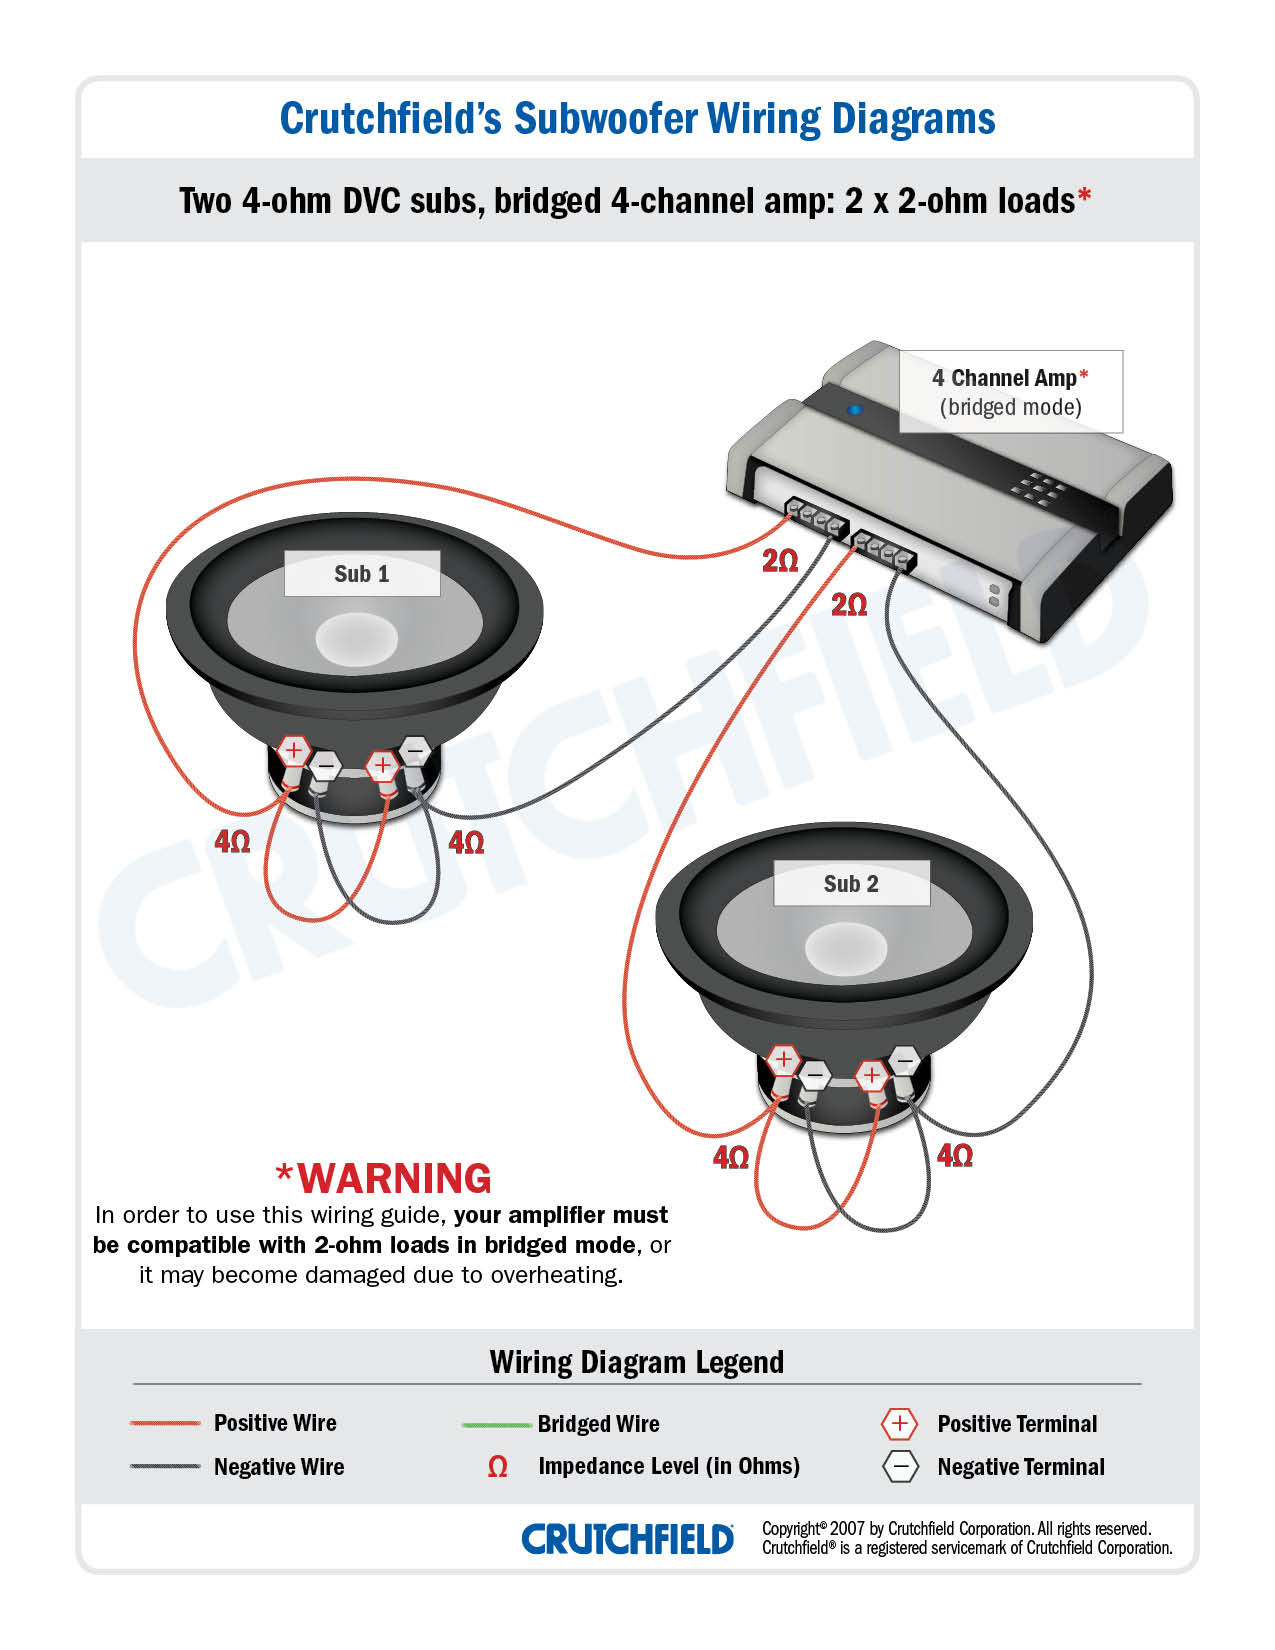 Diagram Svc 4 Ohm Dvc Wiring Diagram Full Version Hd Quality Wiring Diagram Diagramellisb Consorziocolliocarso It